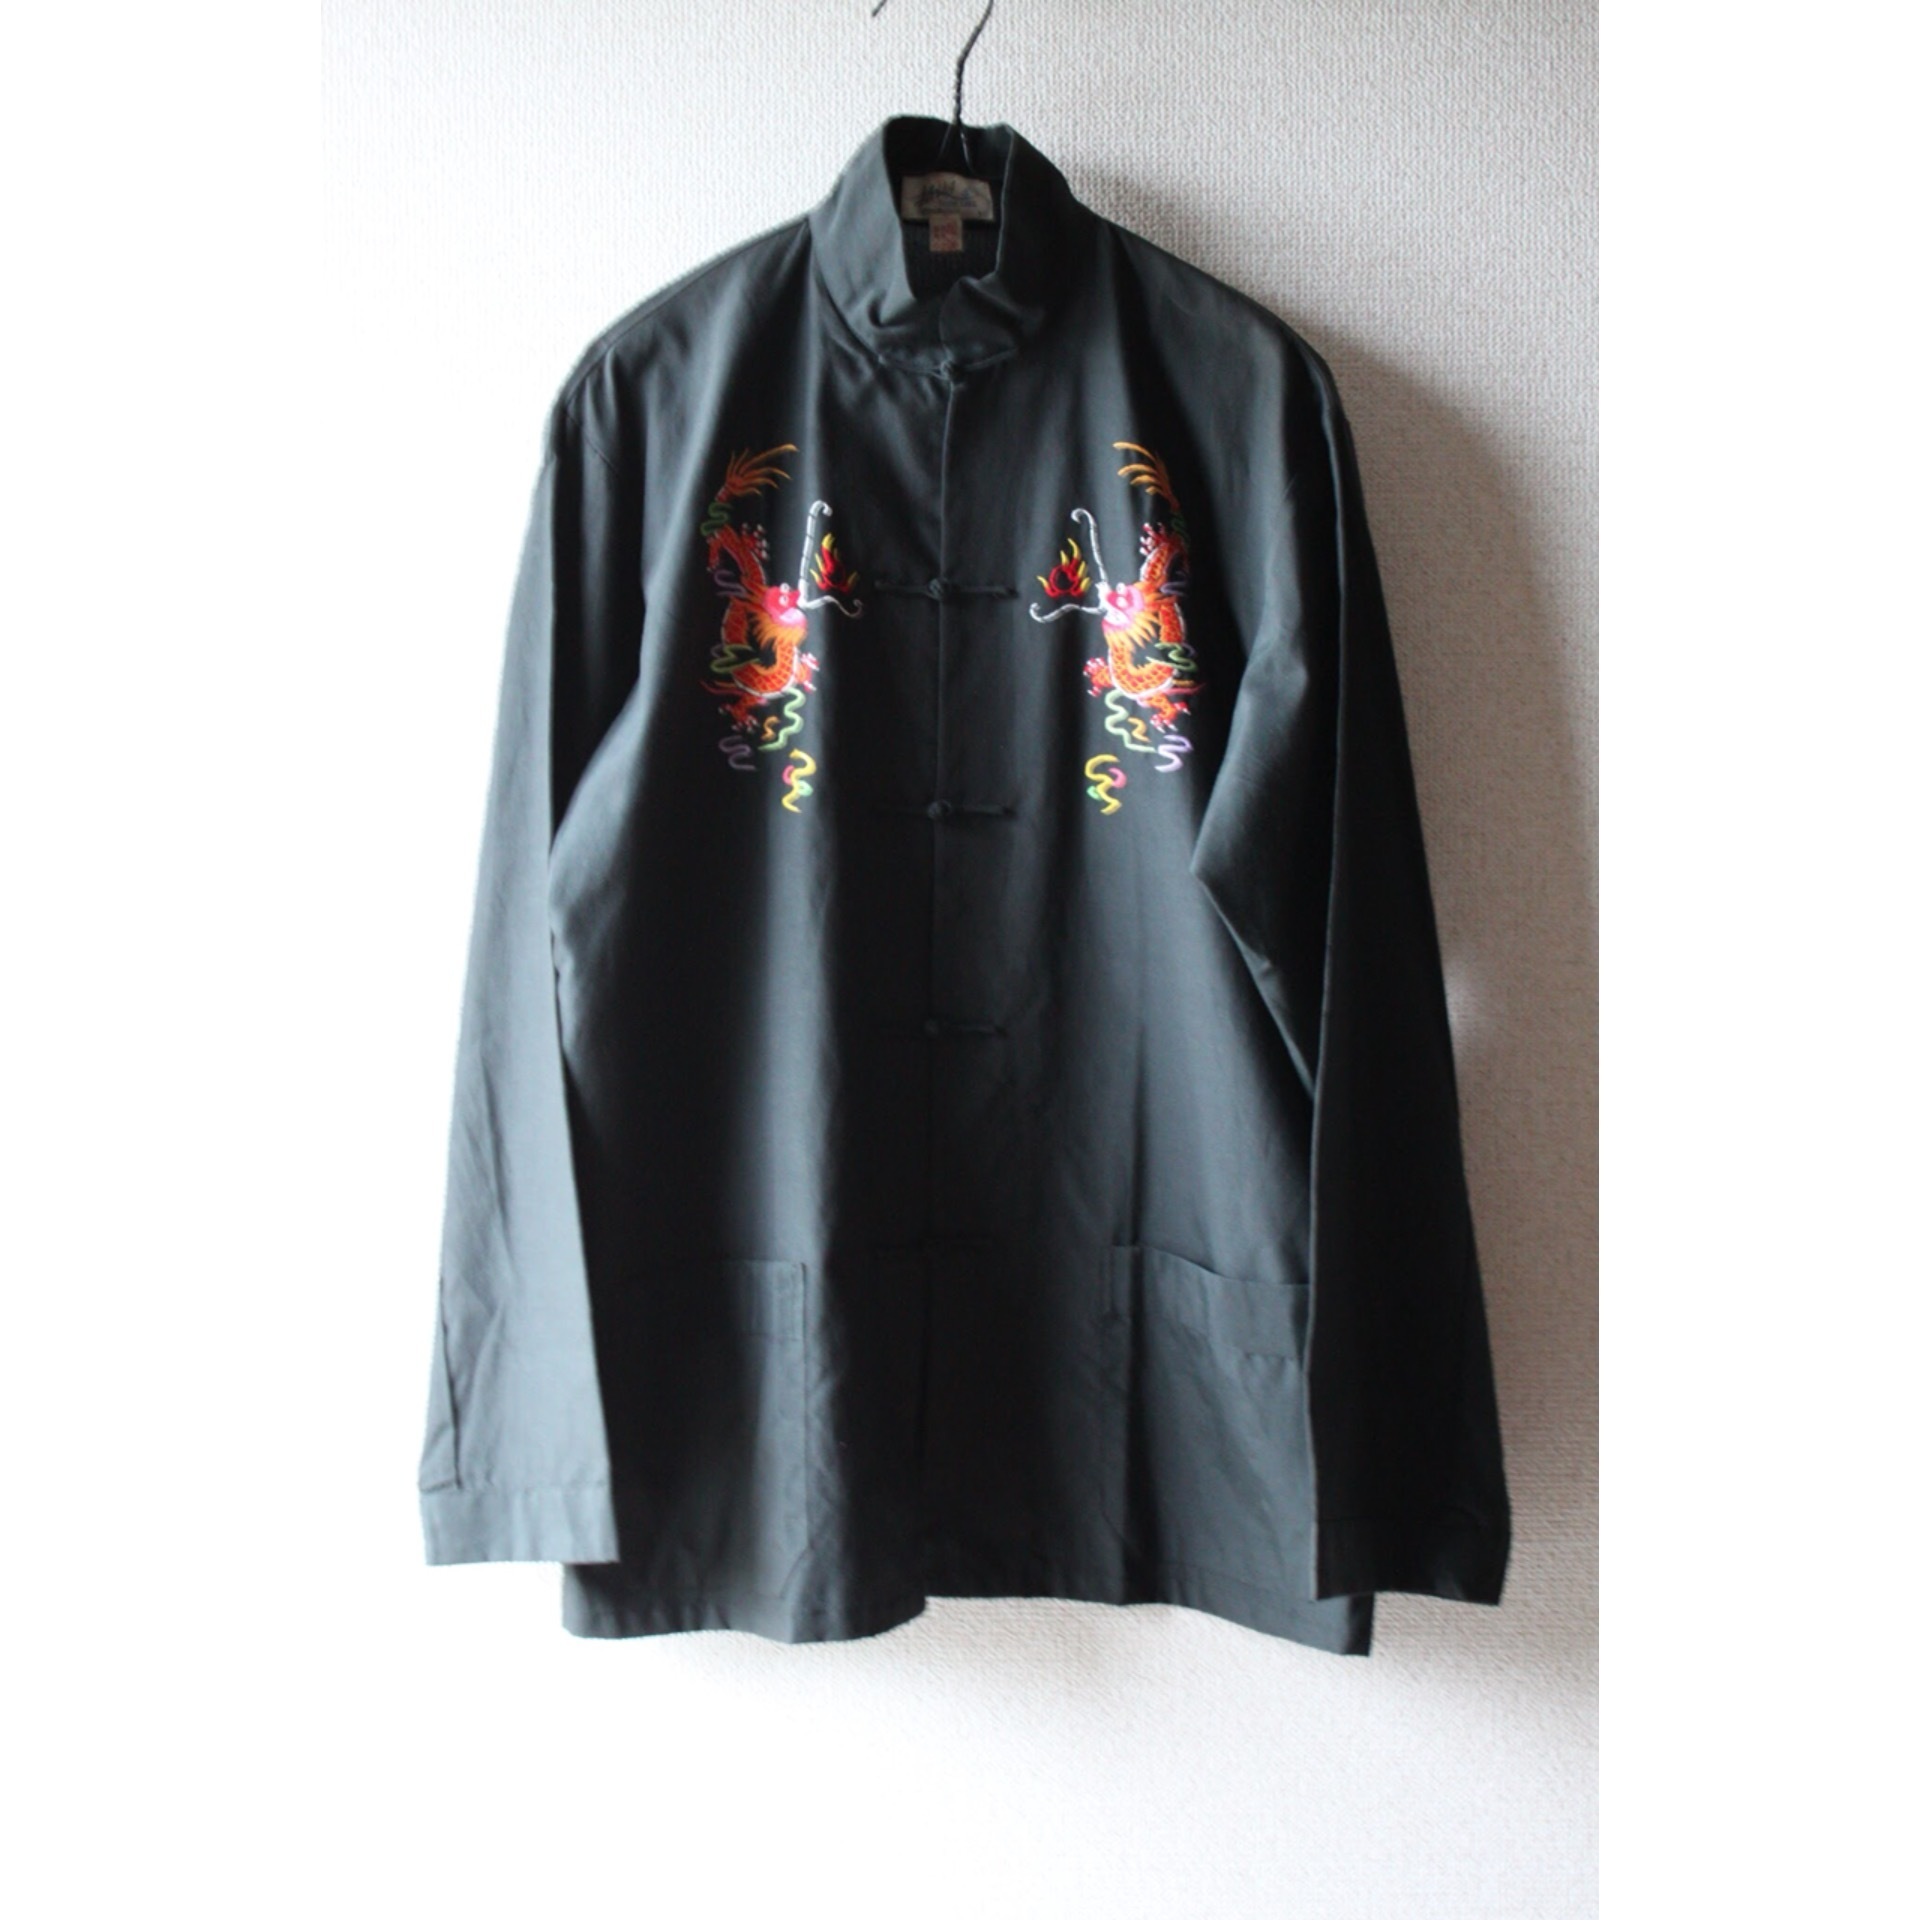 Vintage china embroidery shirt